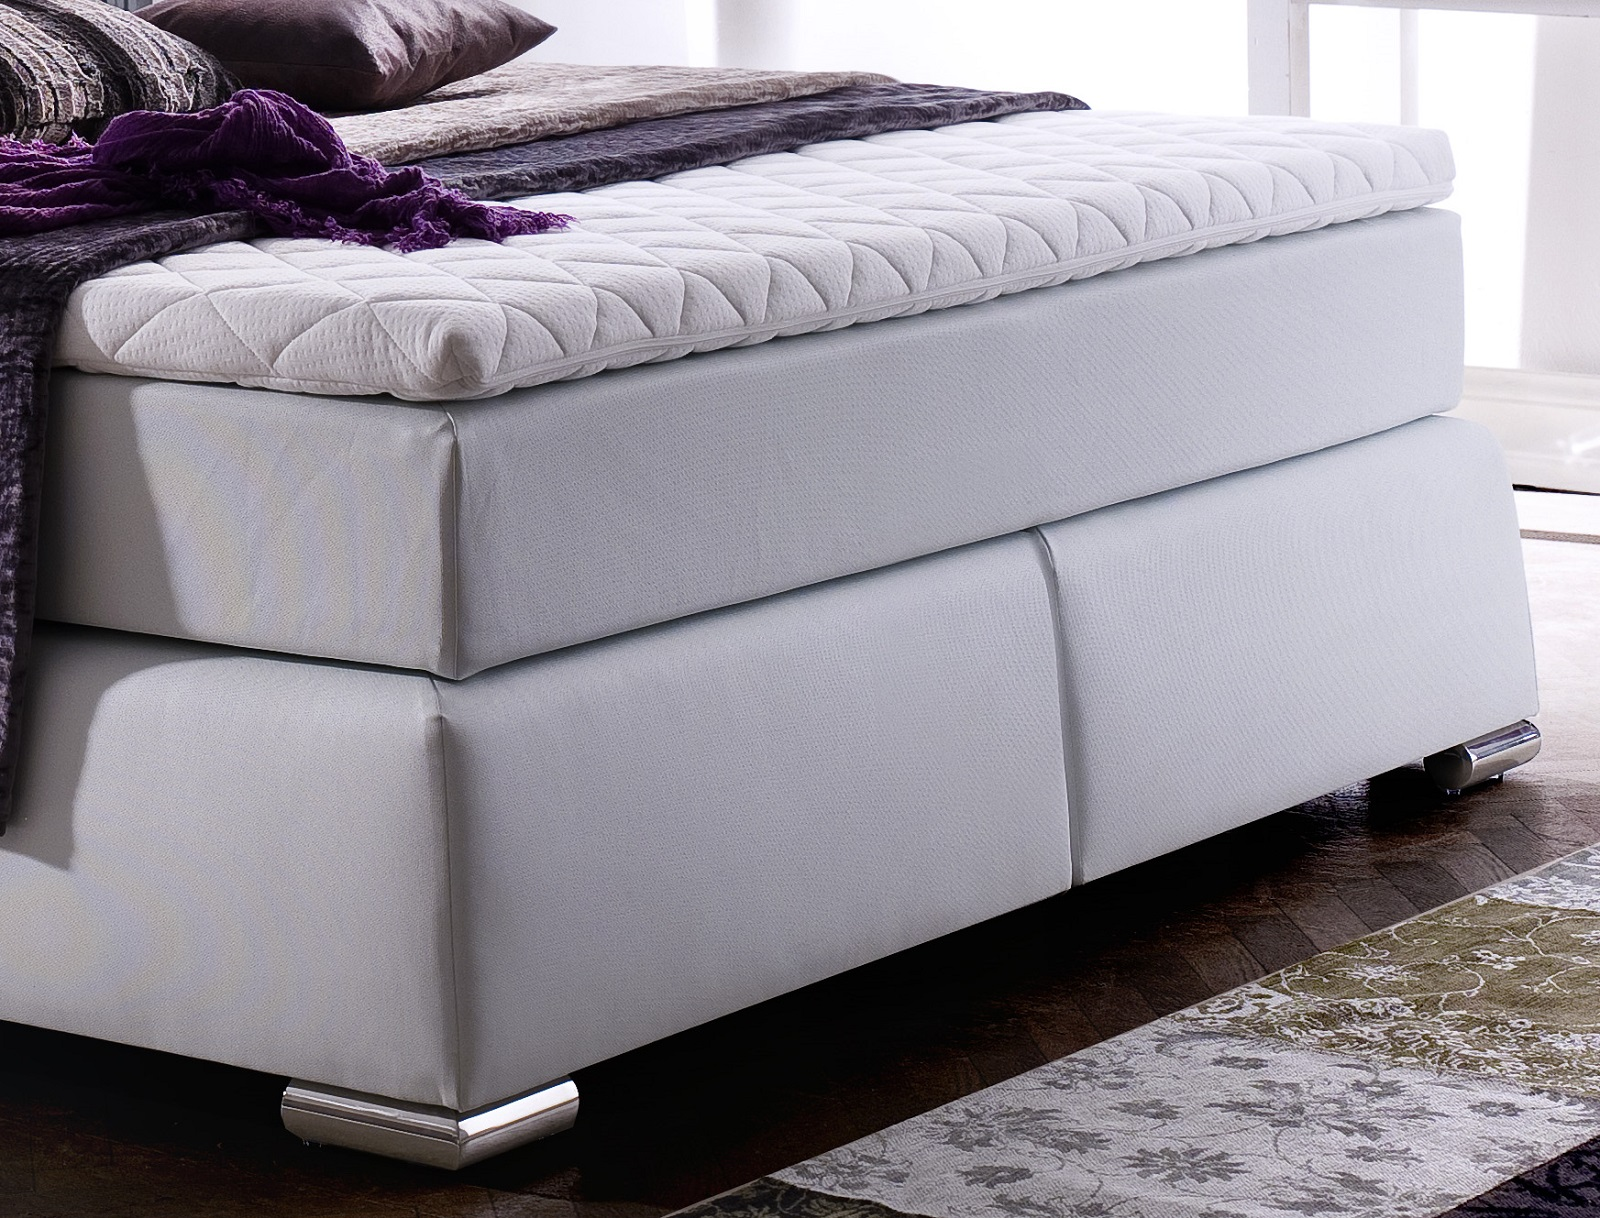 boxspringbett claudine wei 160cm x 200cm. Black Bedroom Furniture Sets. Home Design Ideas